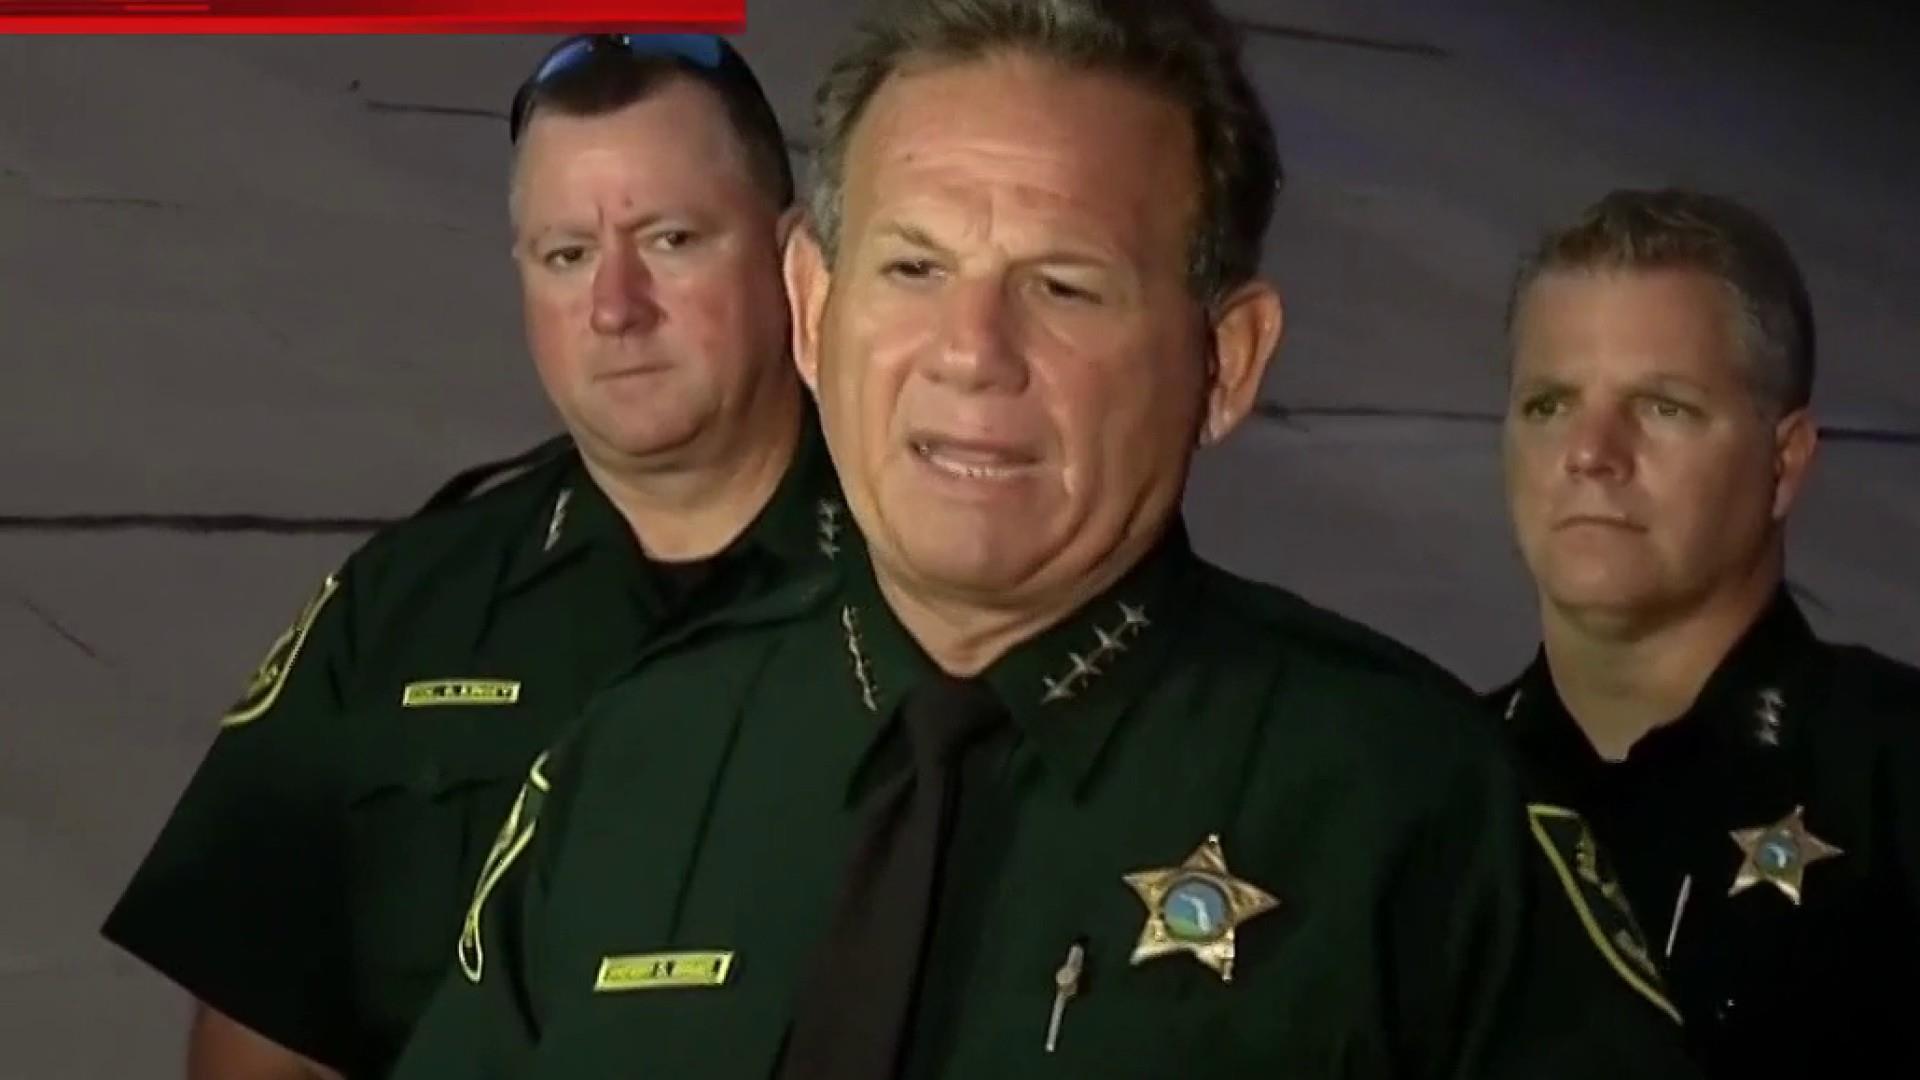 sheriff florida shooting school